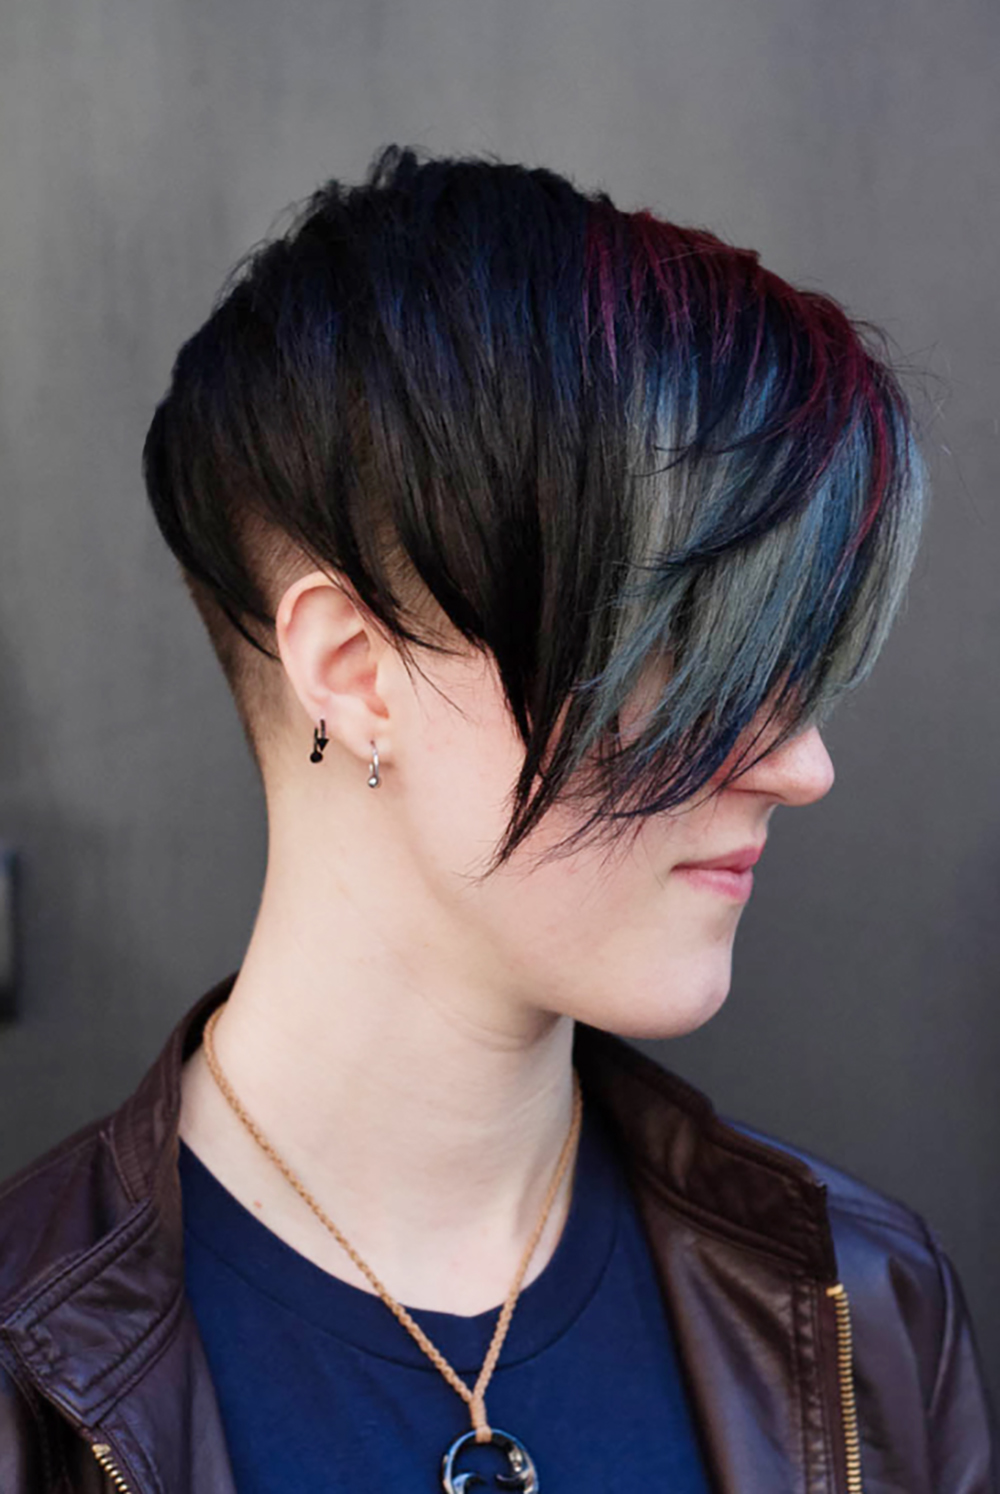 Haircuts by Morphic